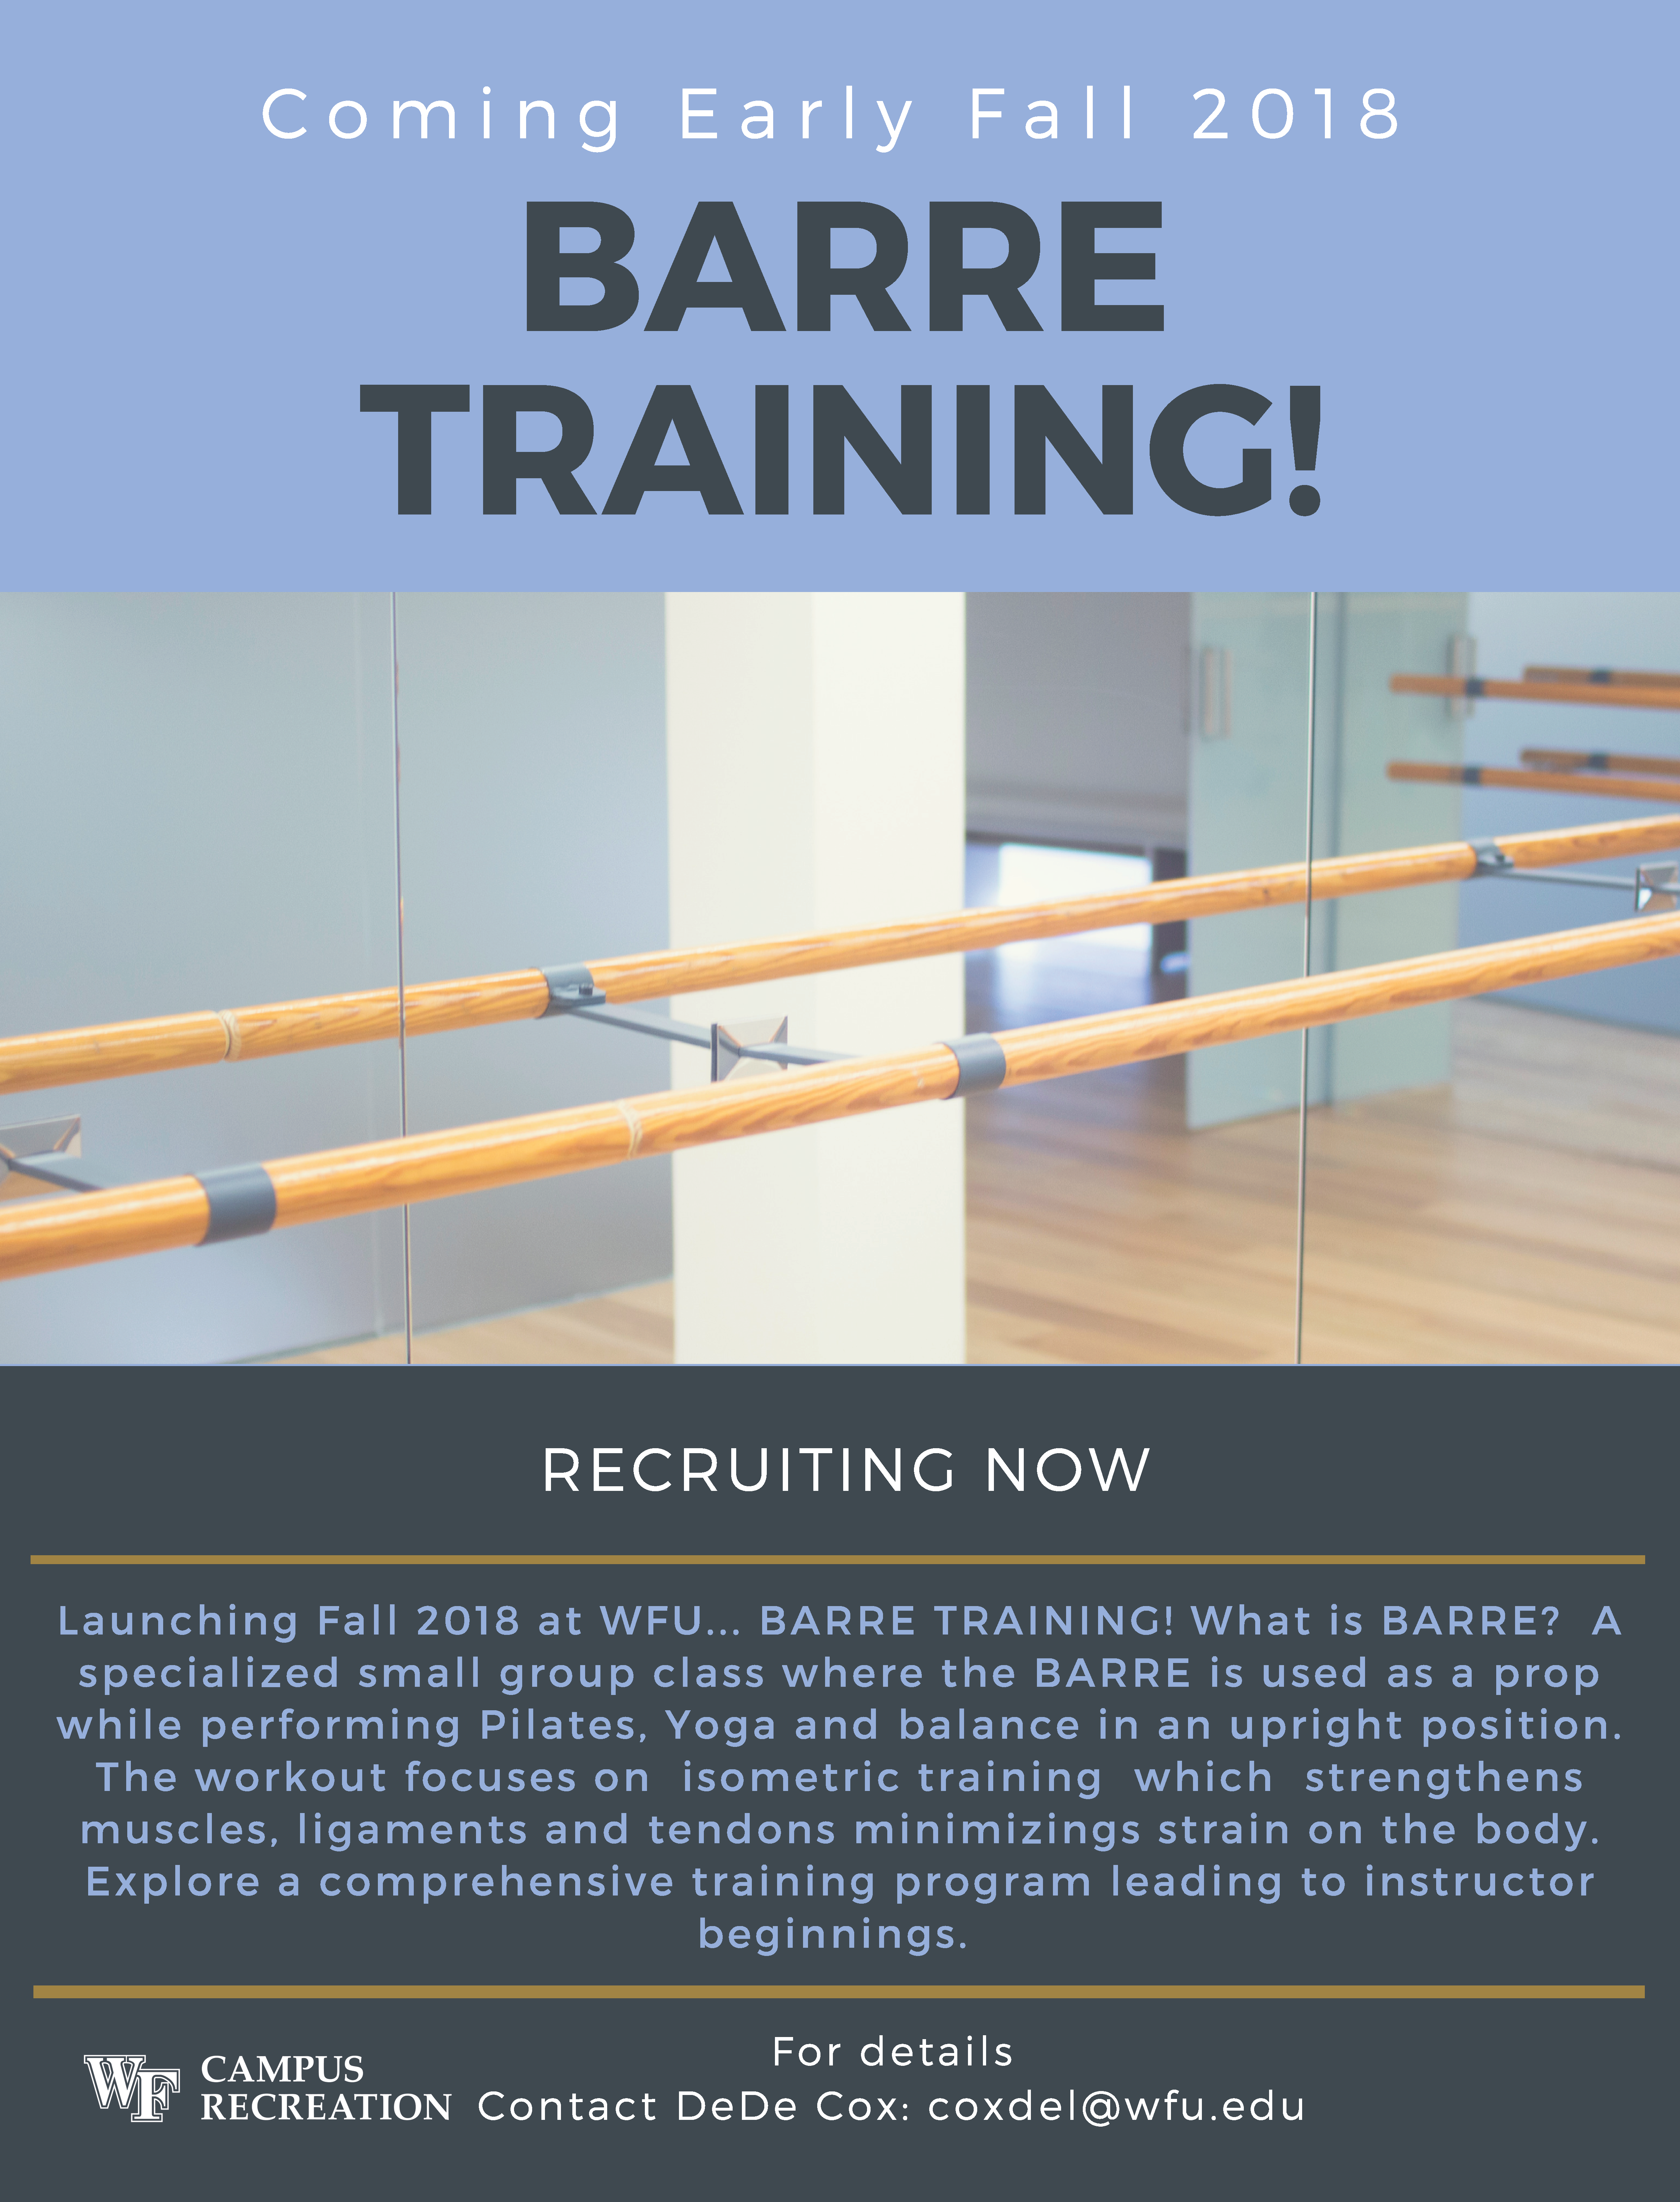 Campus Rec Barre Training Coming 2018